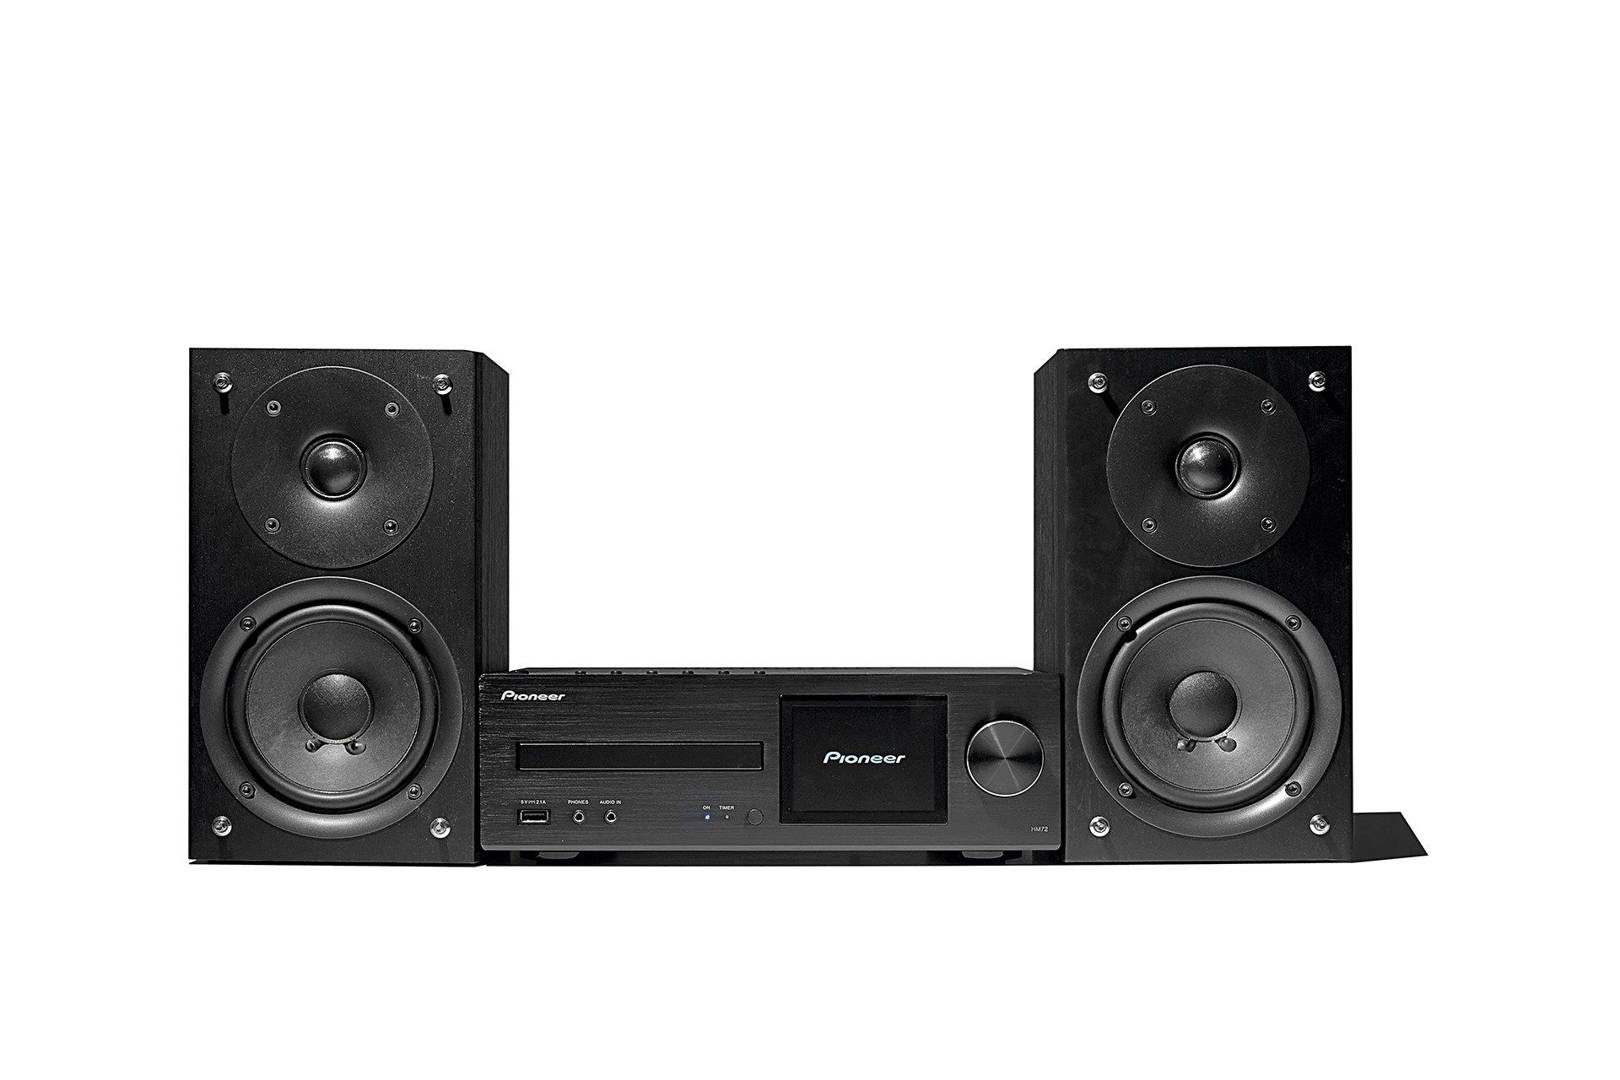 Best mini hi-fi systems reviewed: Panasonic, Denon